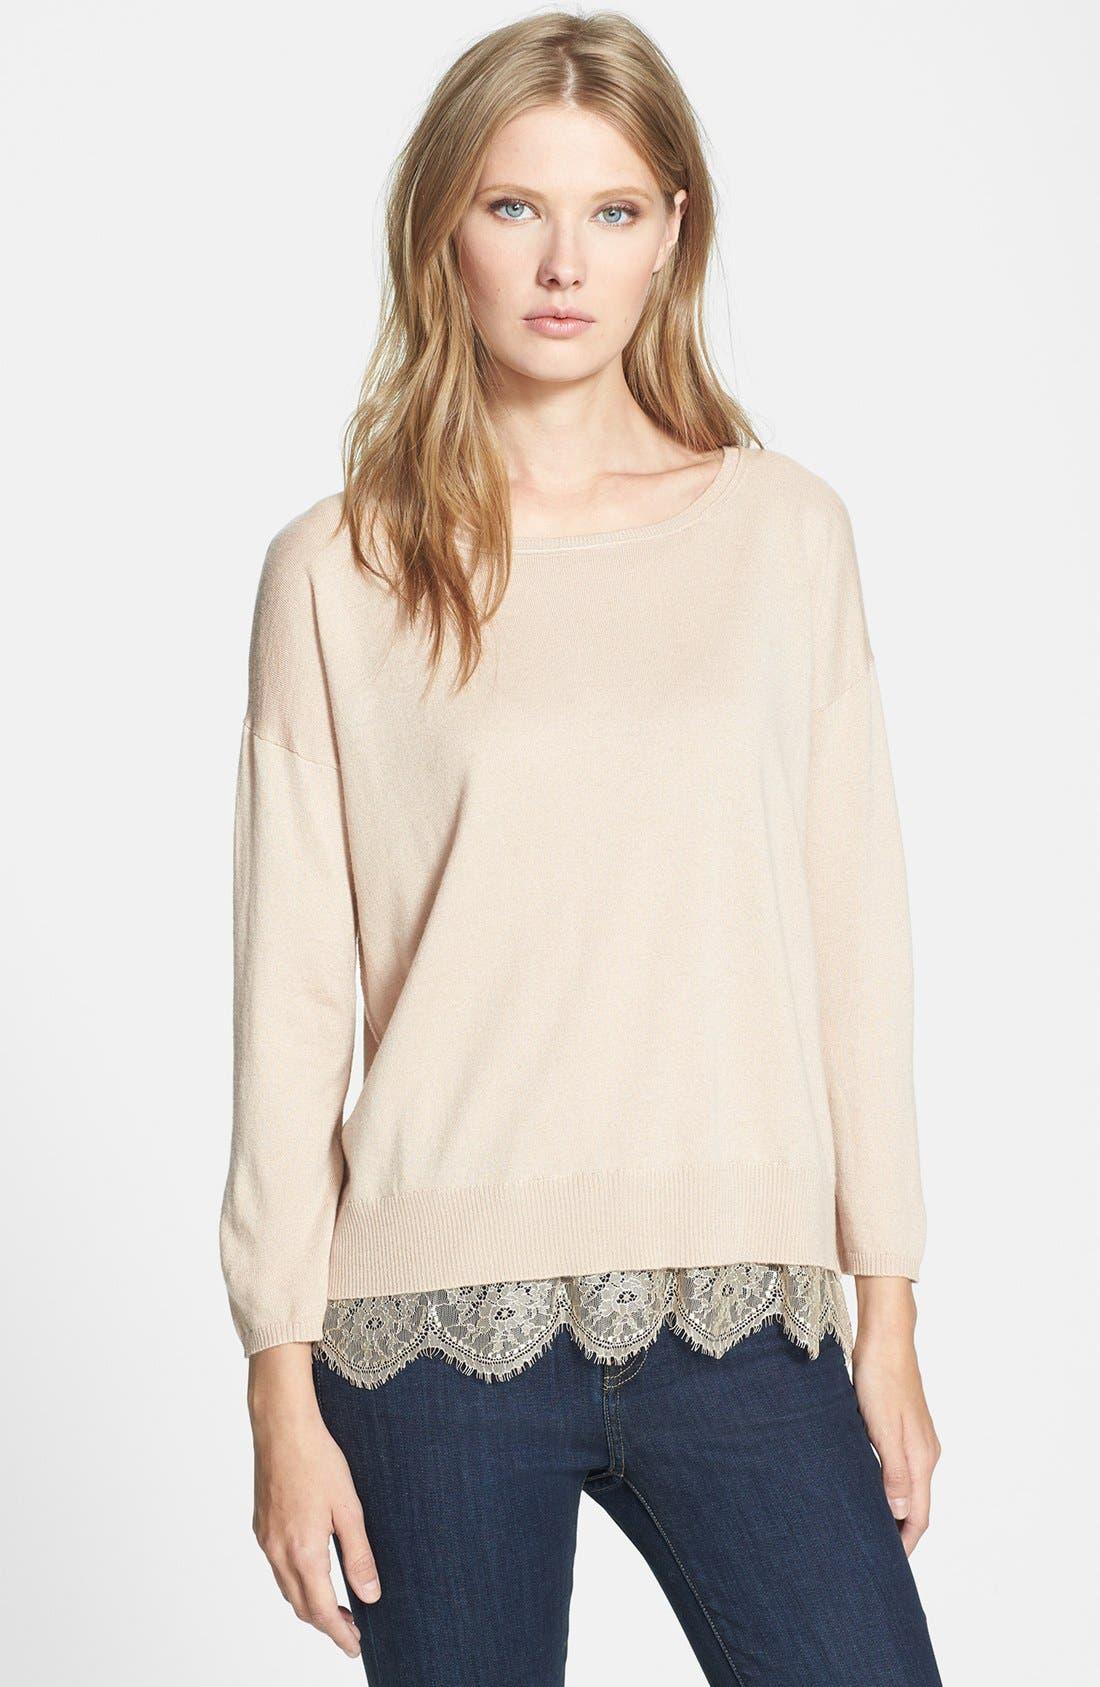 Main Image - Joie 'Hilano' Lace Trim Sweater